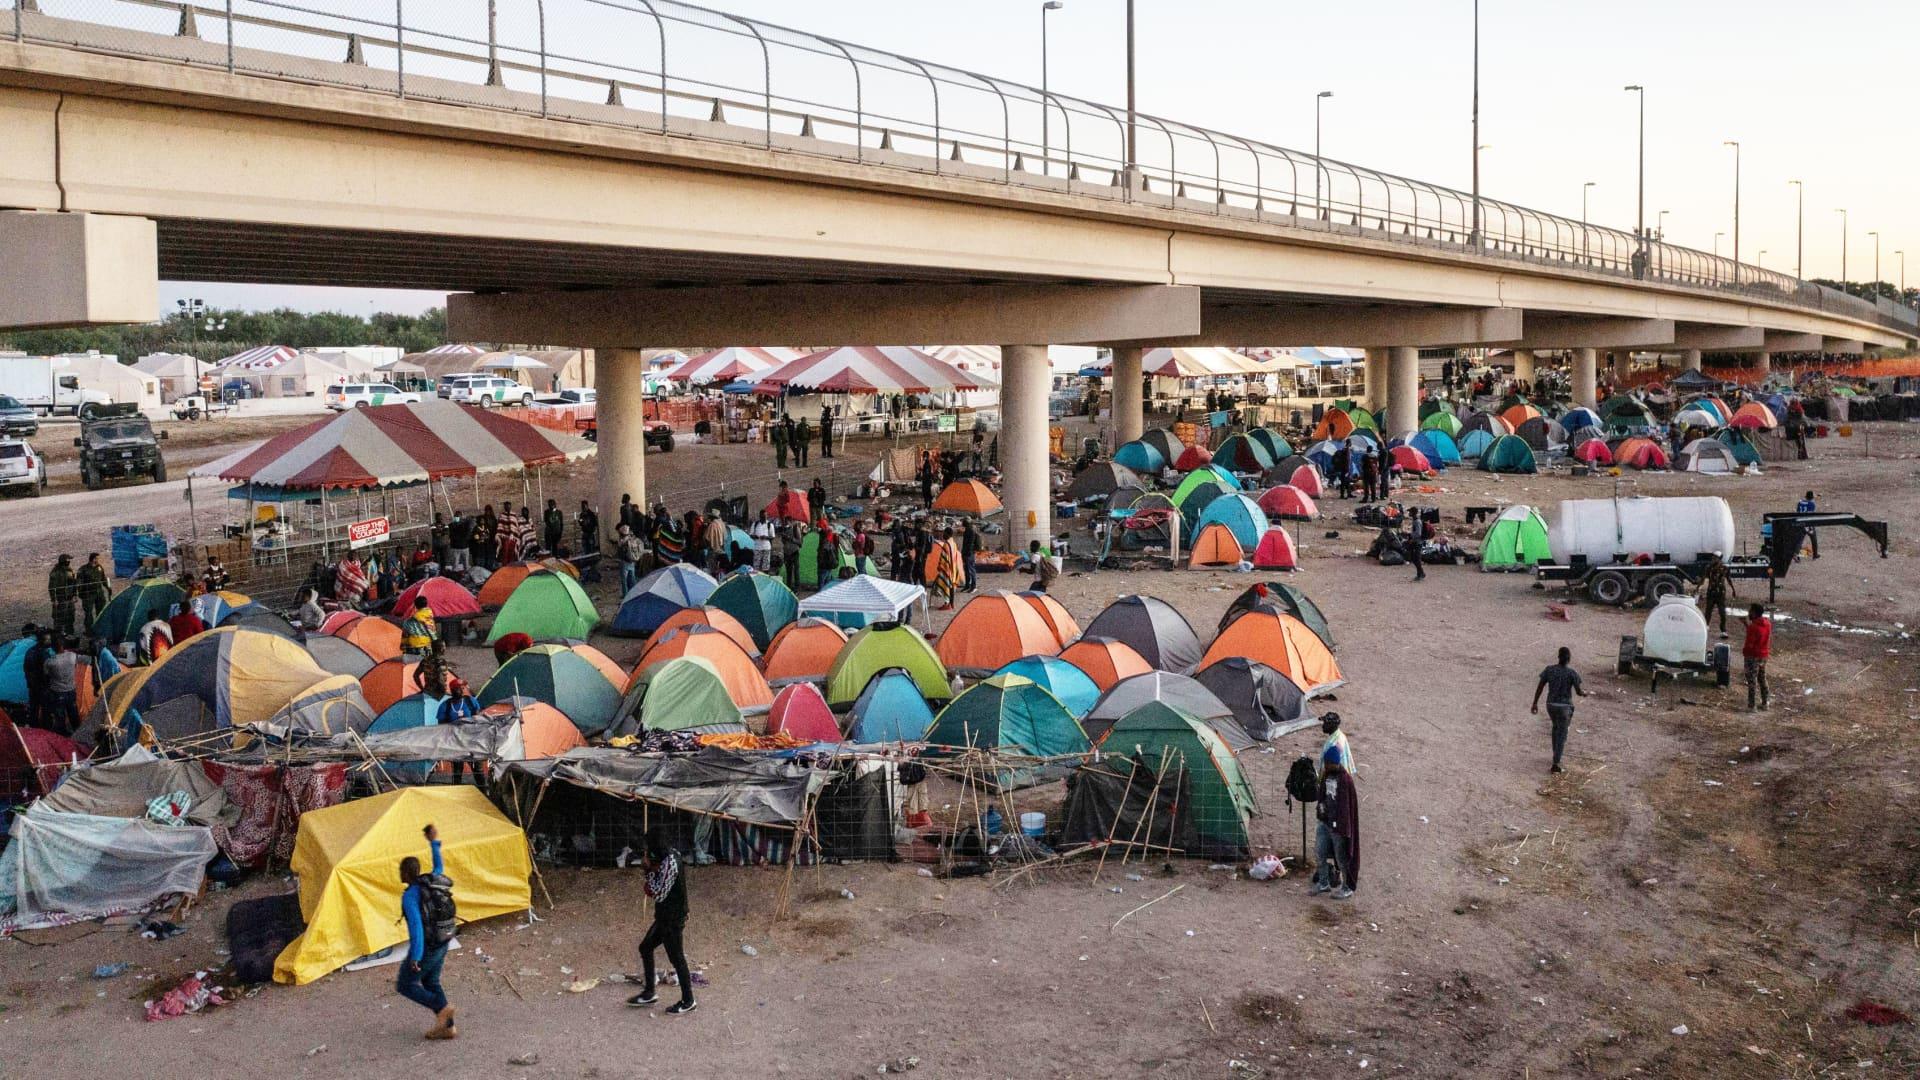 Migrants walk through a makeshift border camp along the International Bridge in Del Rio, Texas, U.S. September 24, 2021.